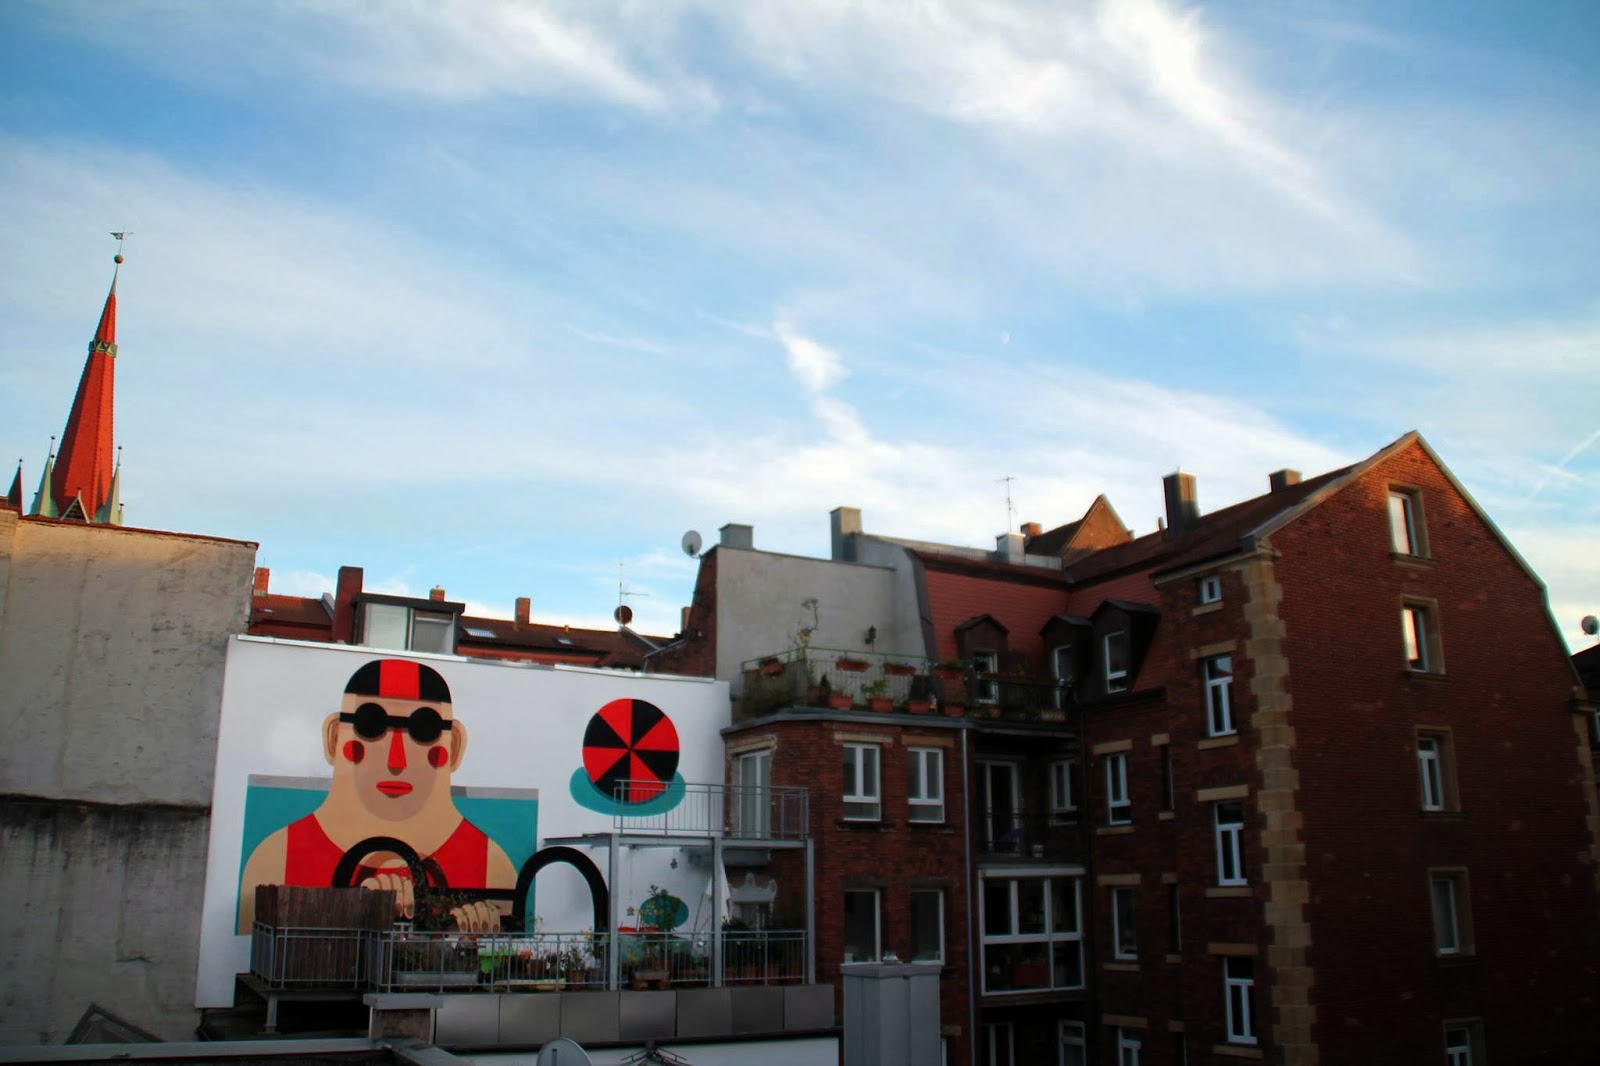 agostino-iacurci-new-mural-nuremberg-germany-03